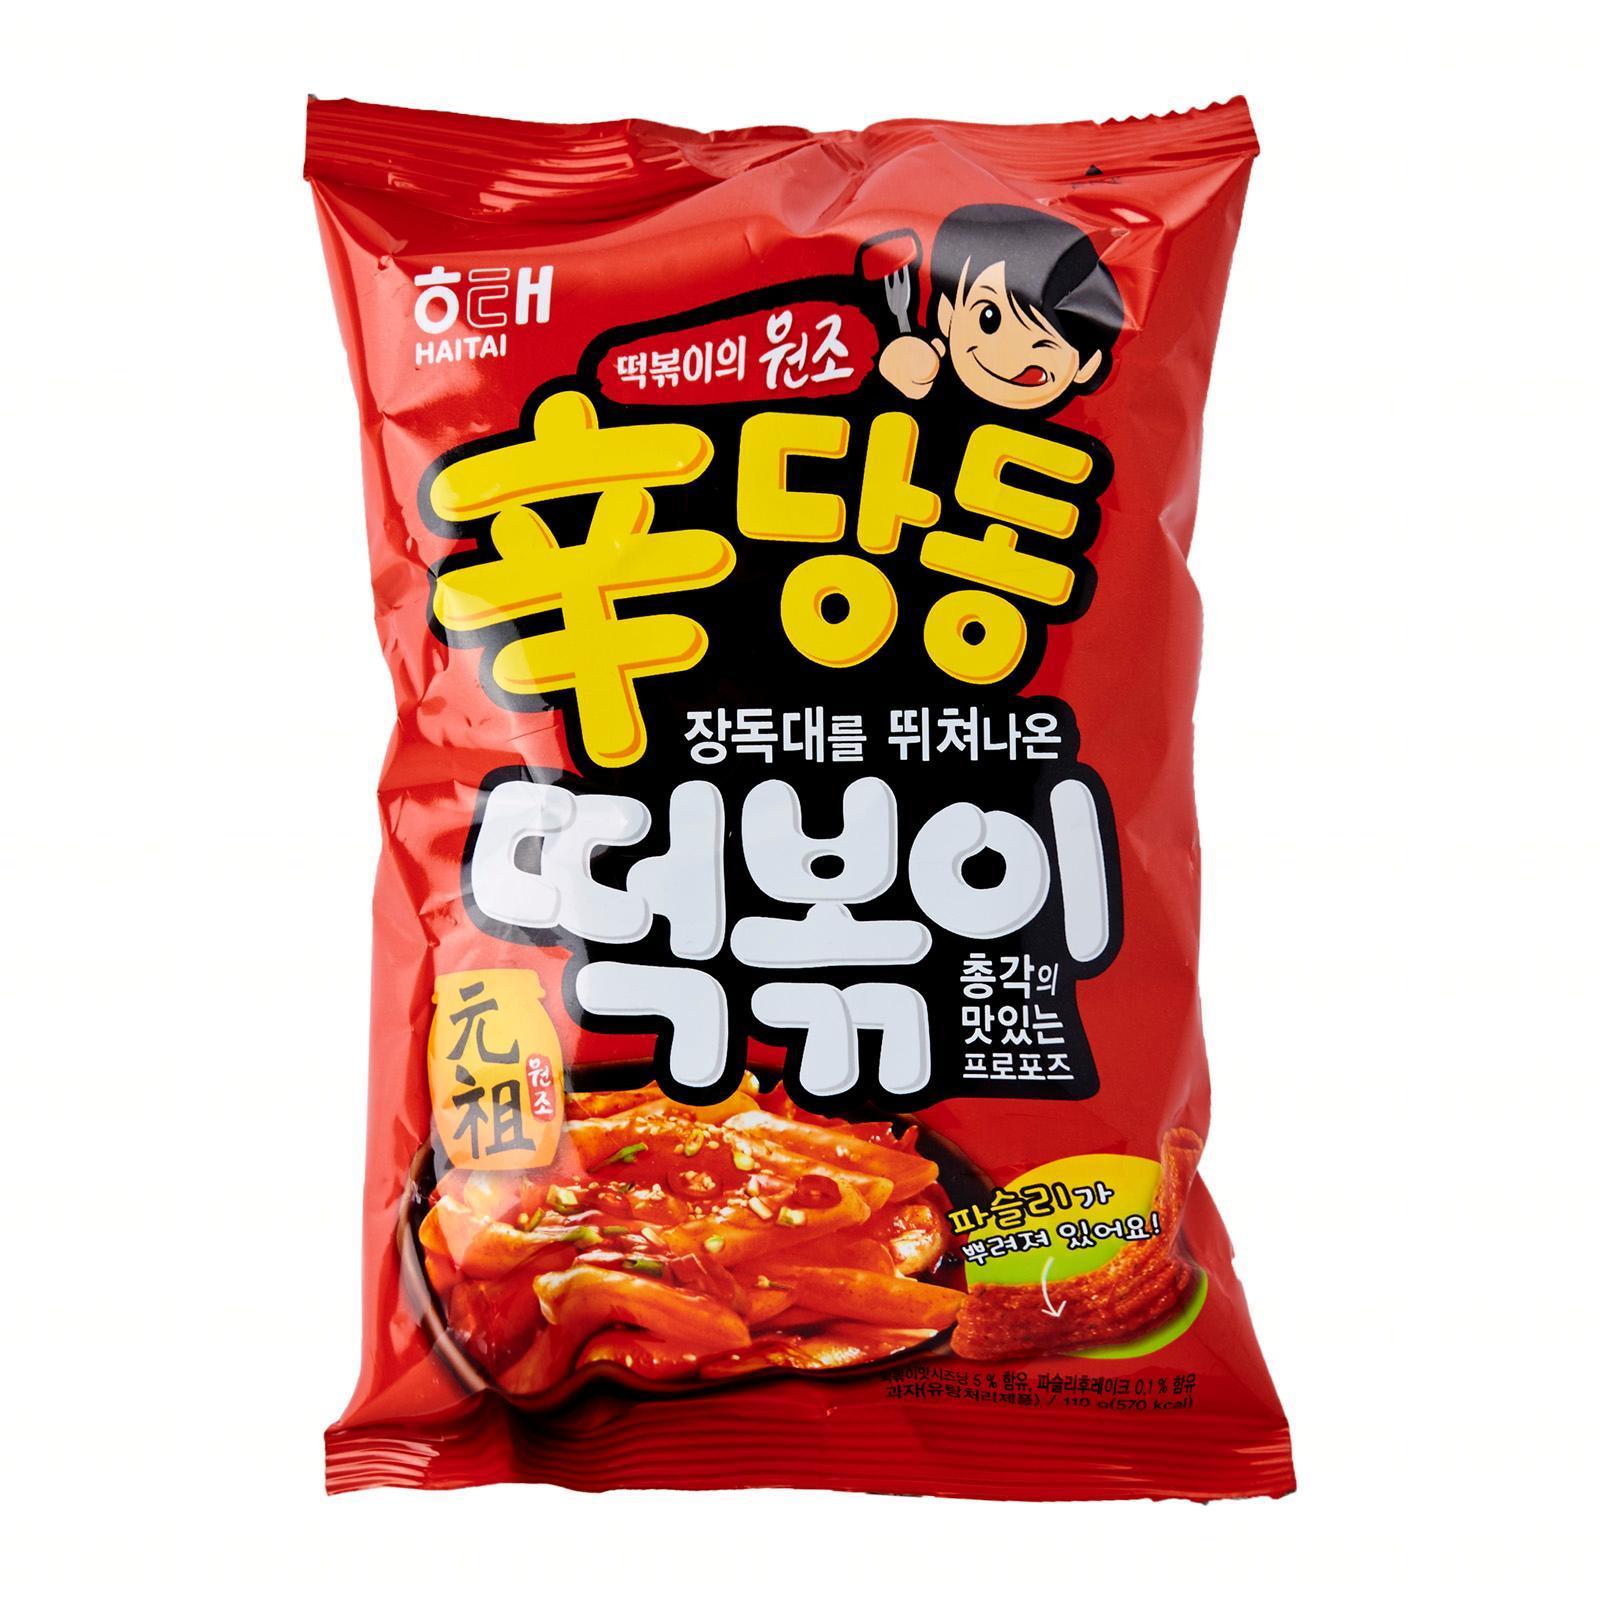 HaiTai Korean Sindangdong Spicy and Sour Tteokbokki Rice Cake Shaped Snacks